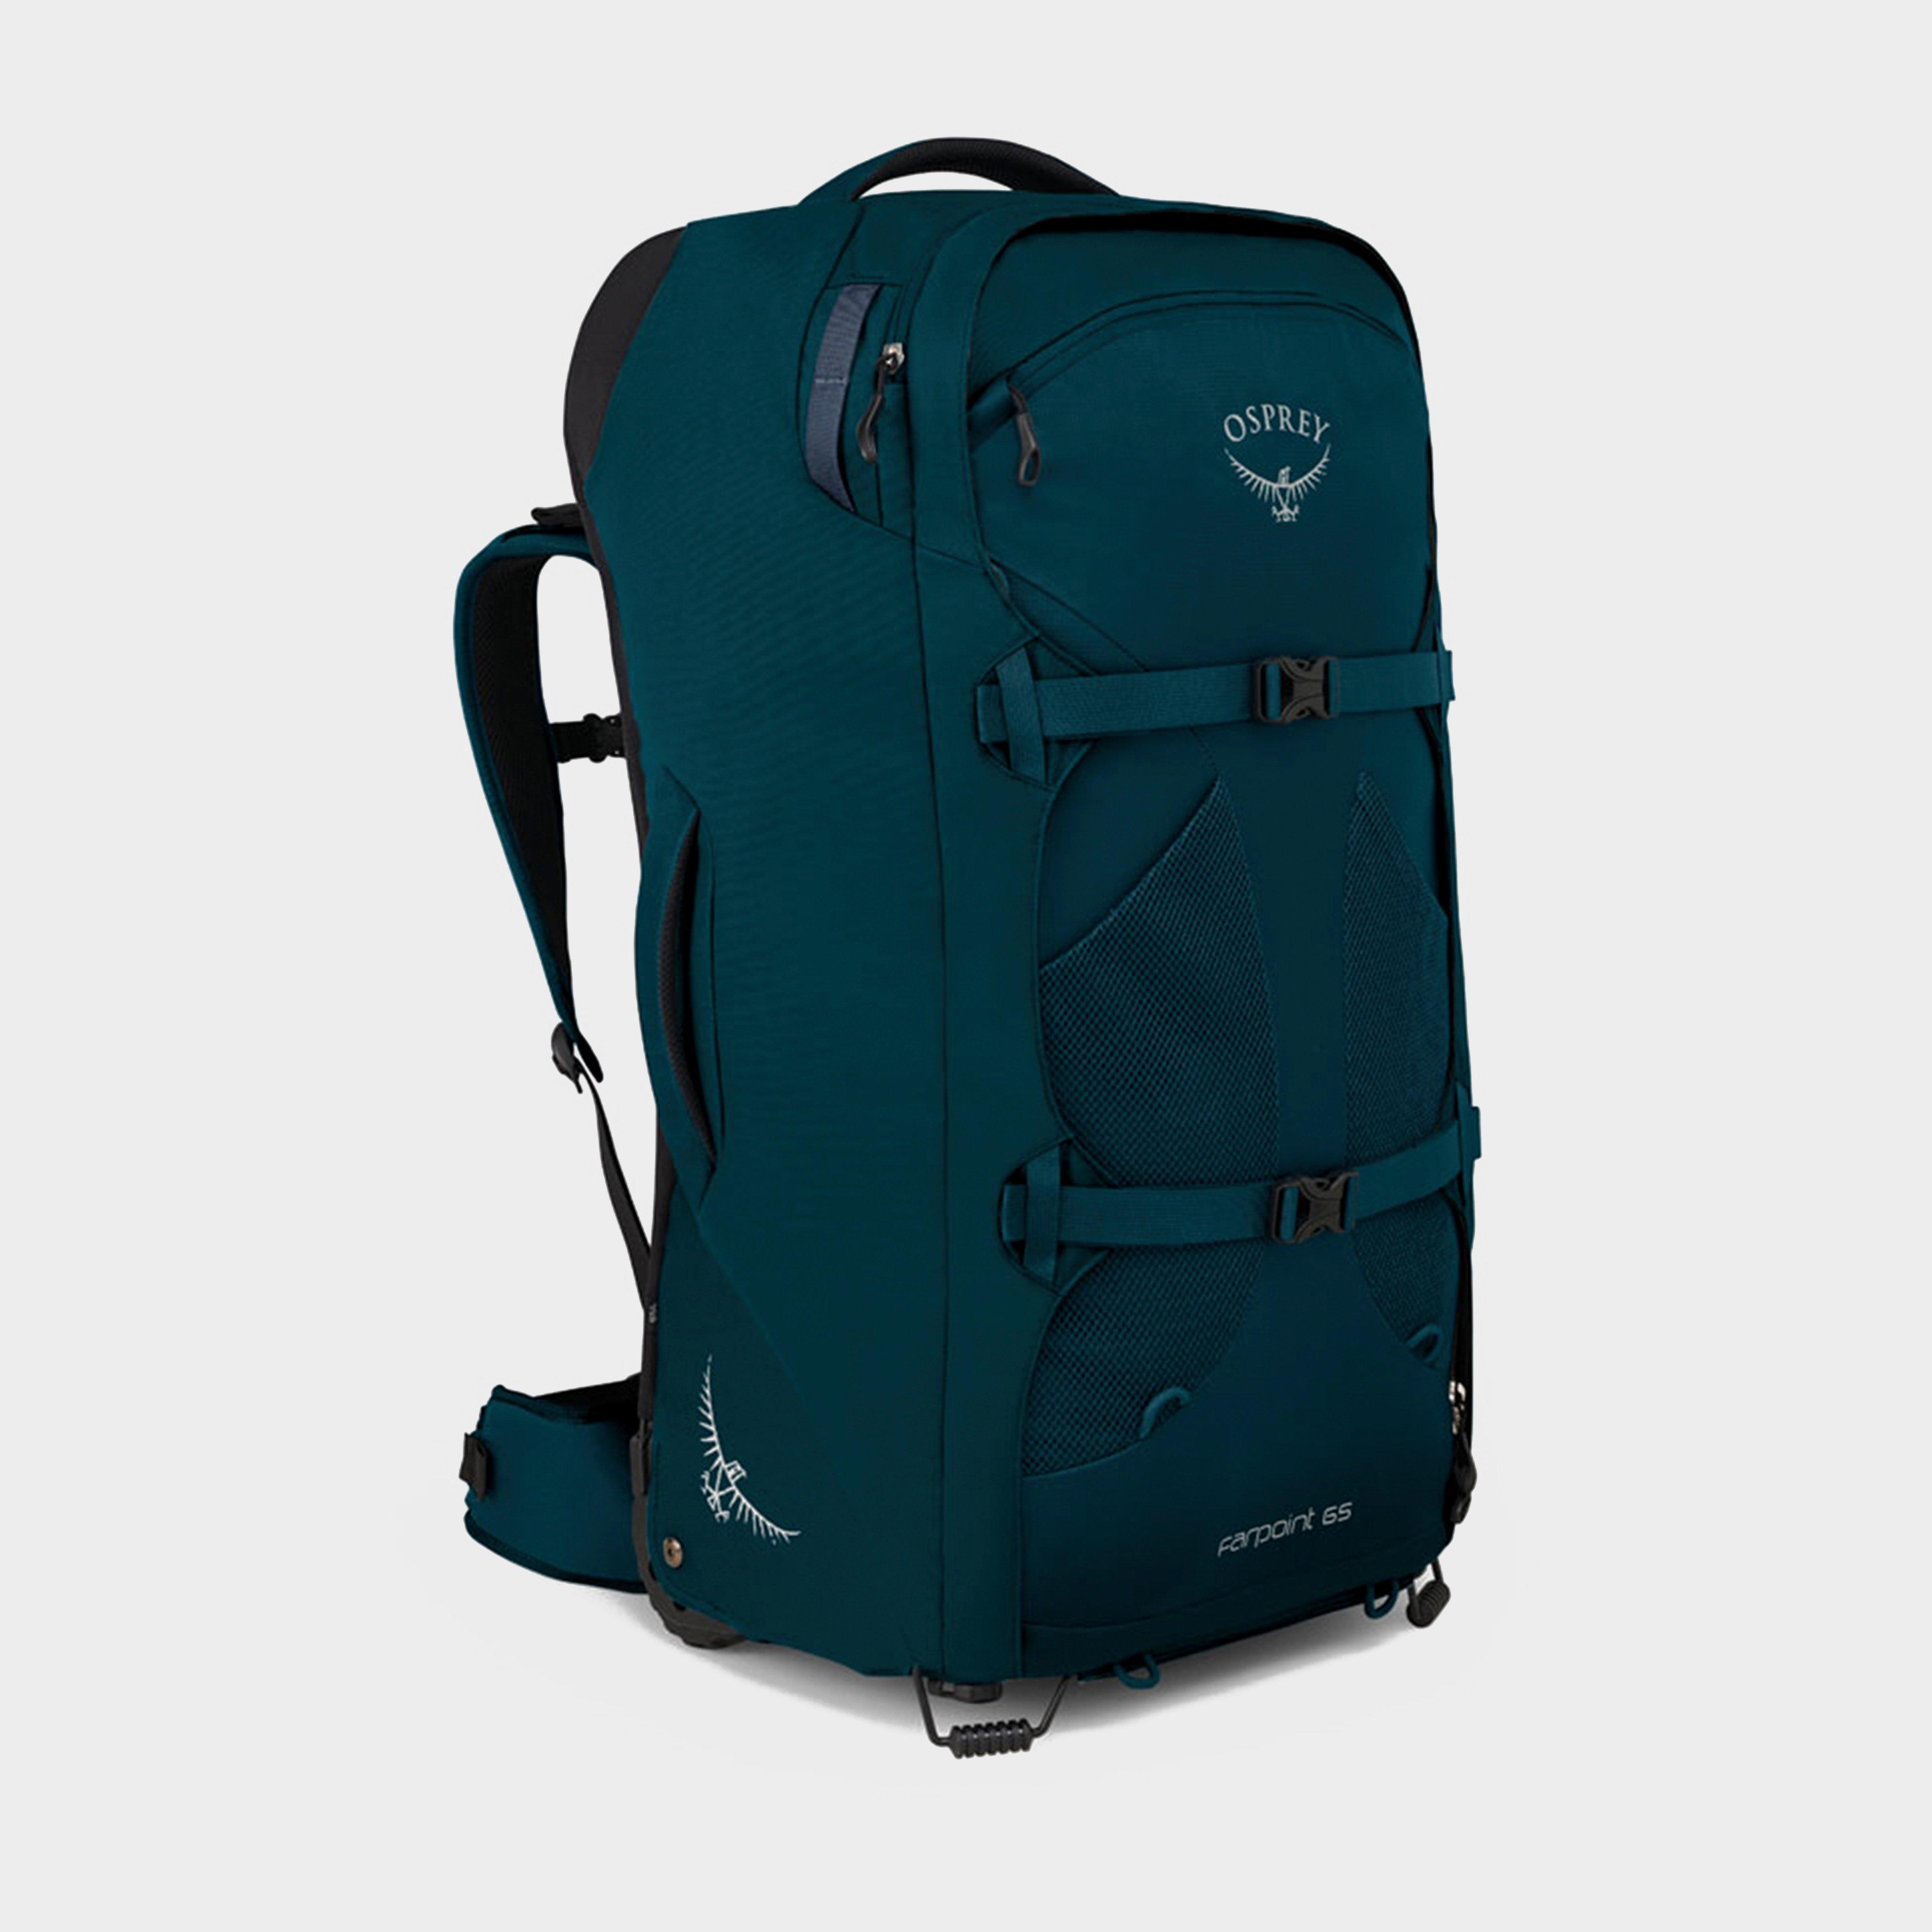 Osprey Farpoint Wheels 65 Travel Backpack - Blue, Blue